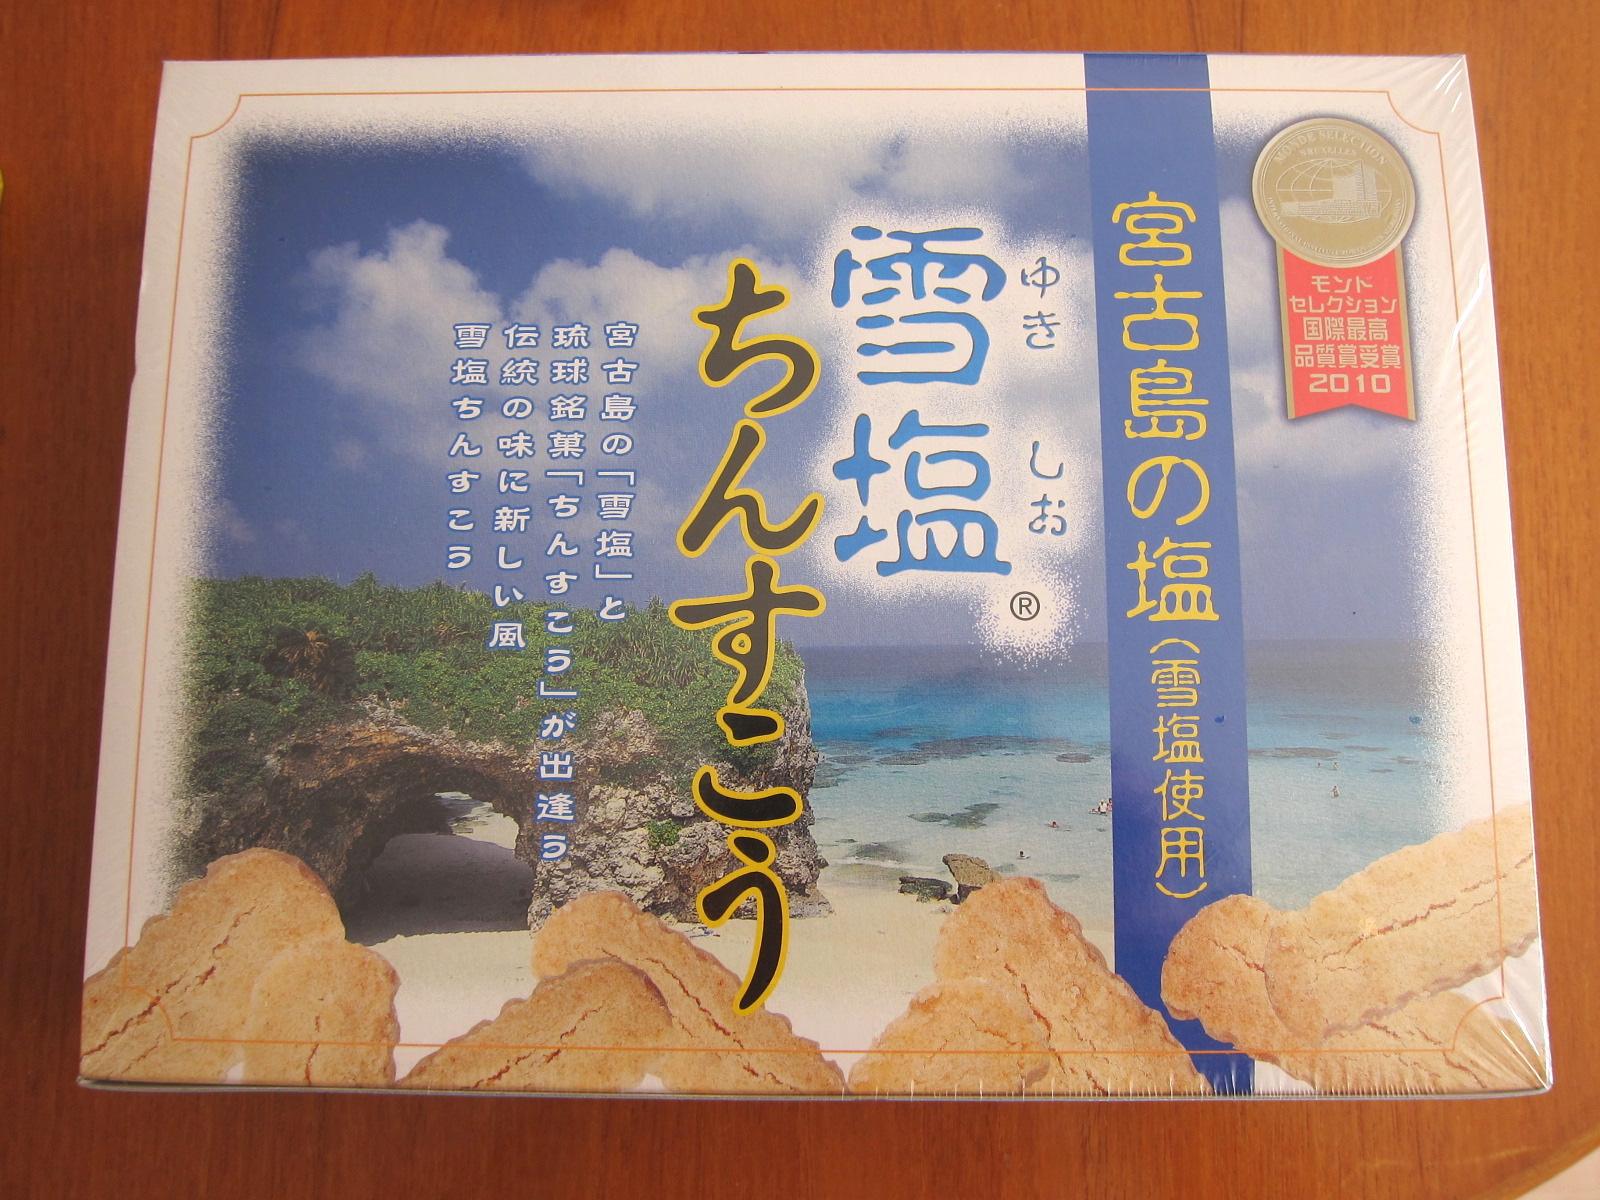 Miyako Okinawa Day 4 Painagama Beach Farewell To Japan Lucy